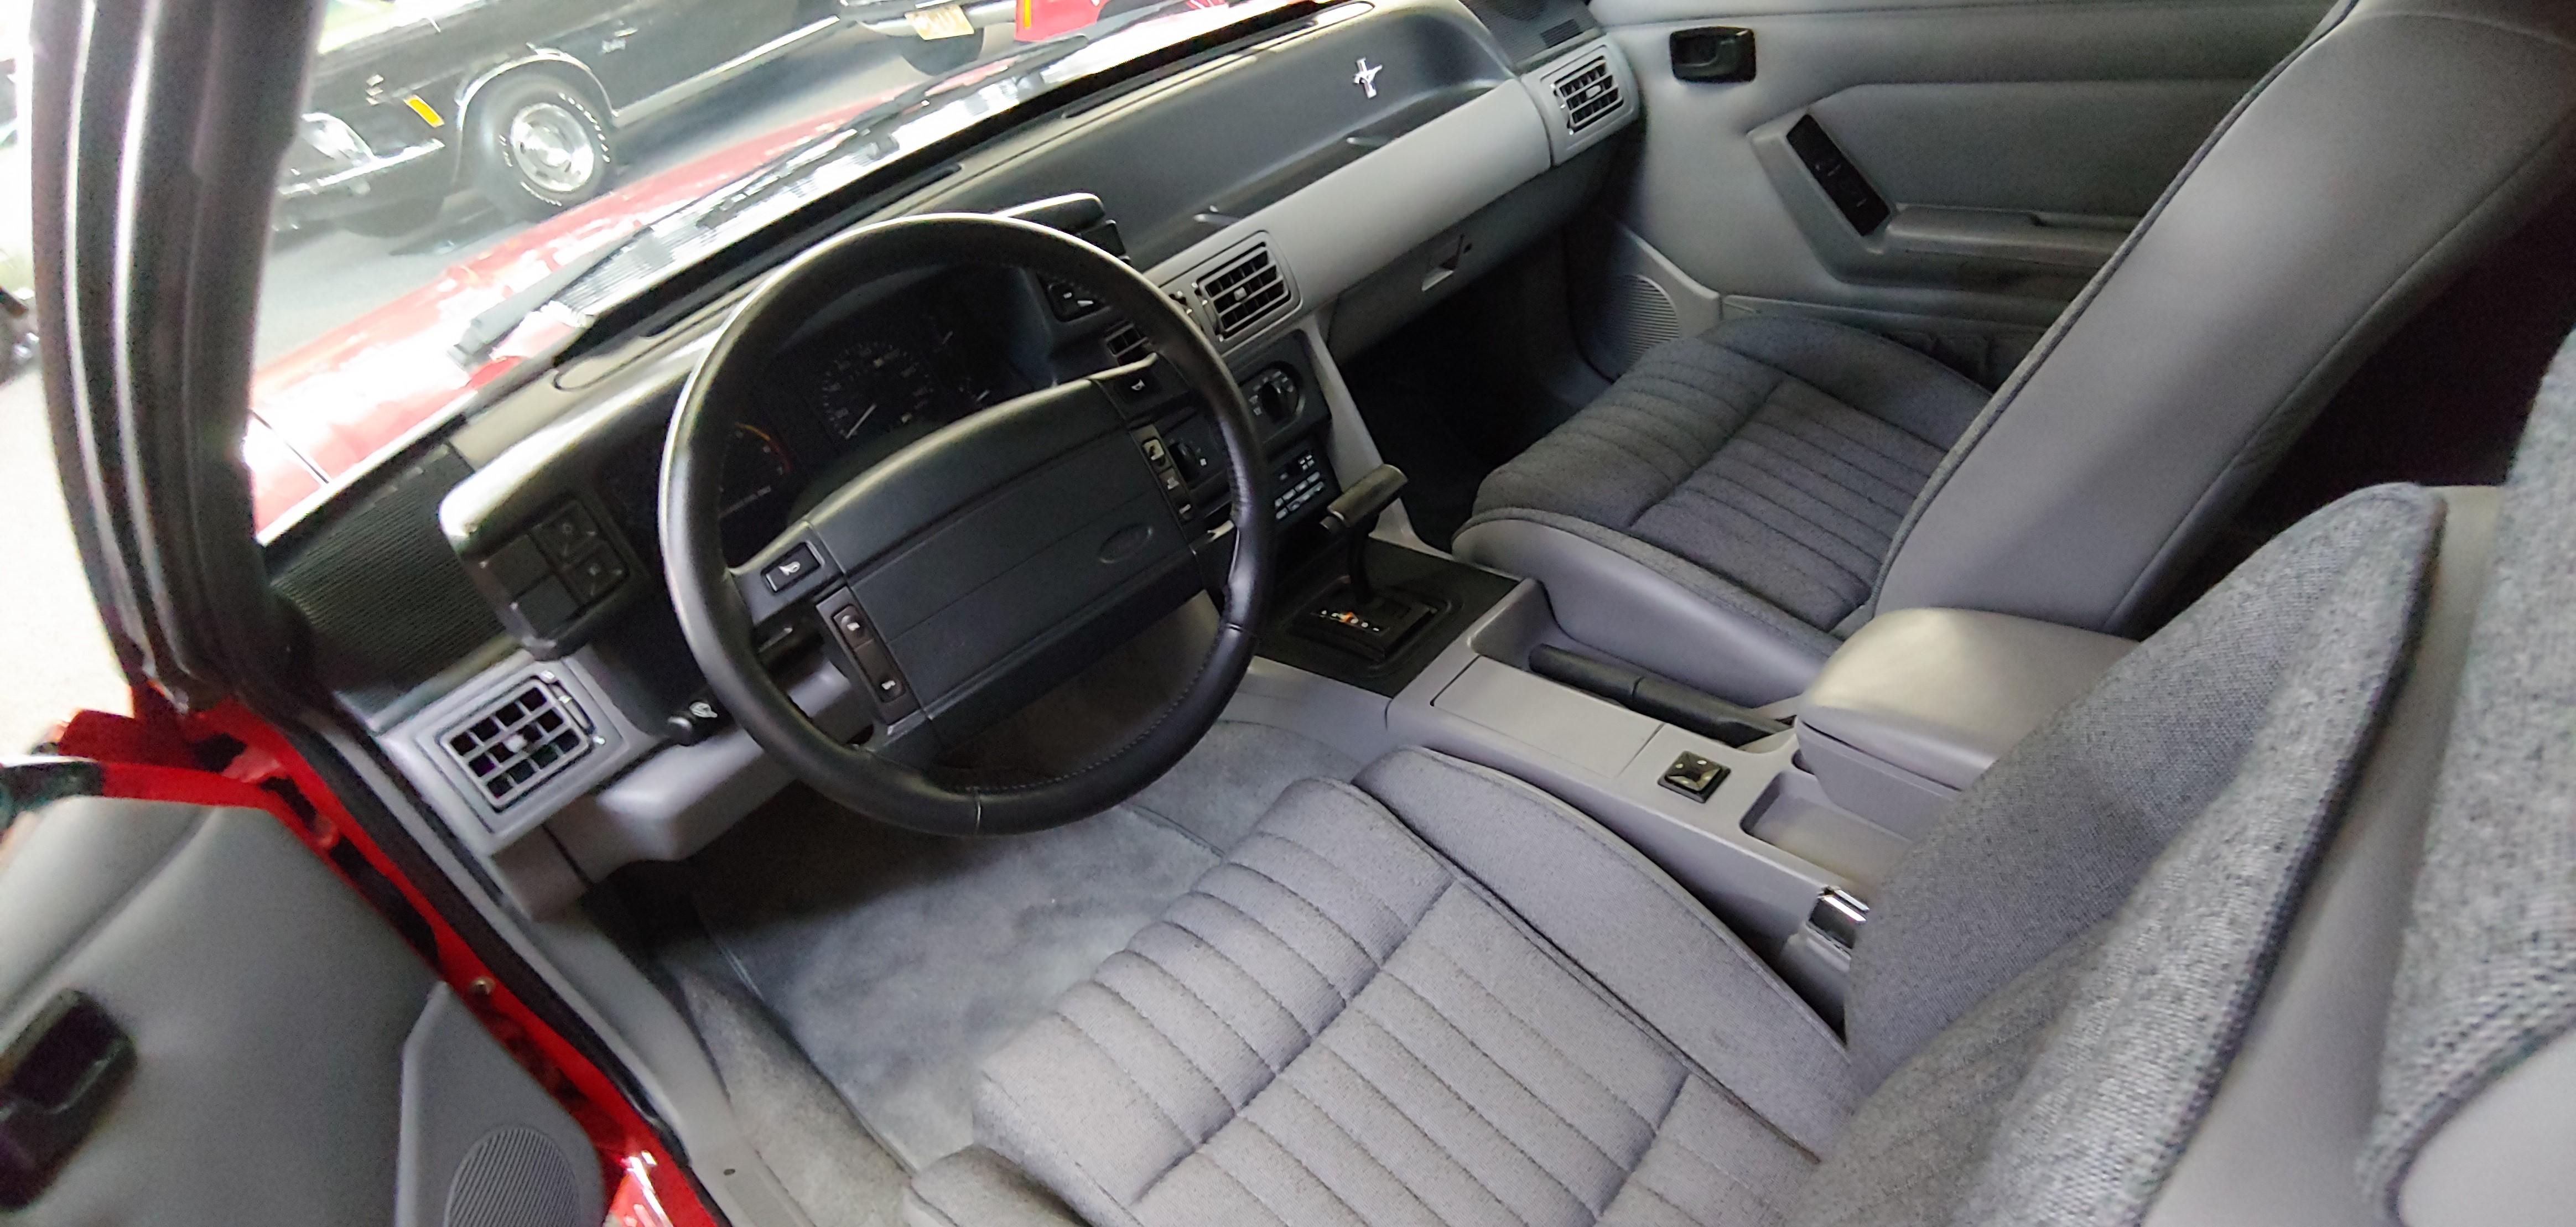 Mustang Foxbody interior